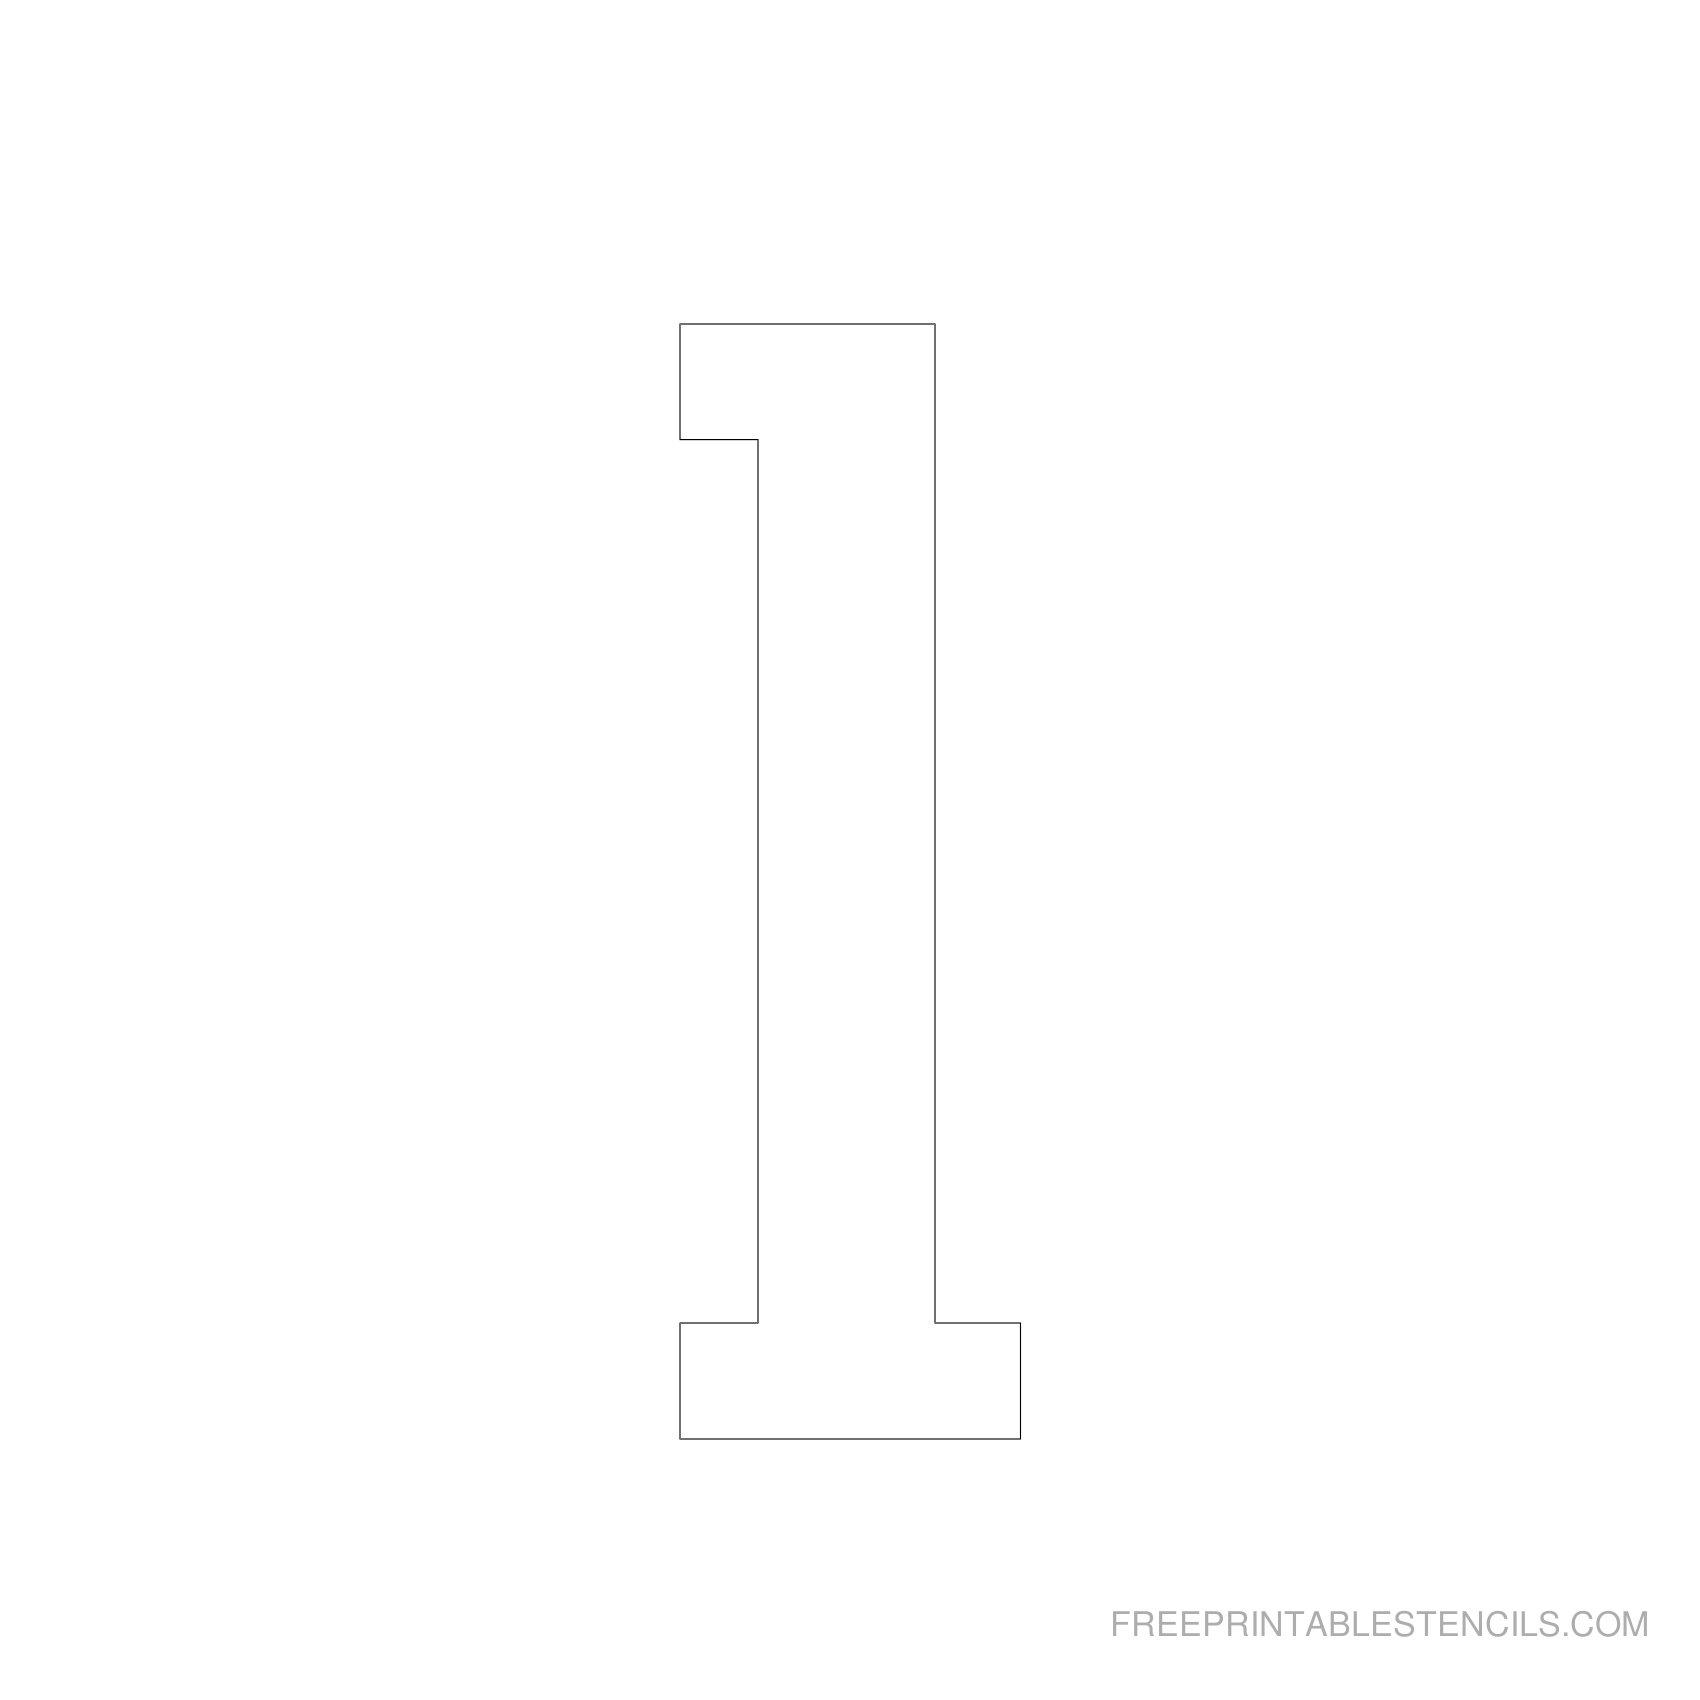 Printable 5 Inch Number Stencils 1-10 | Free Printable Stencils - One Inch Stencils Printable Free